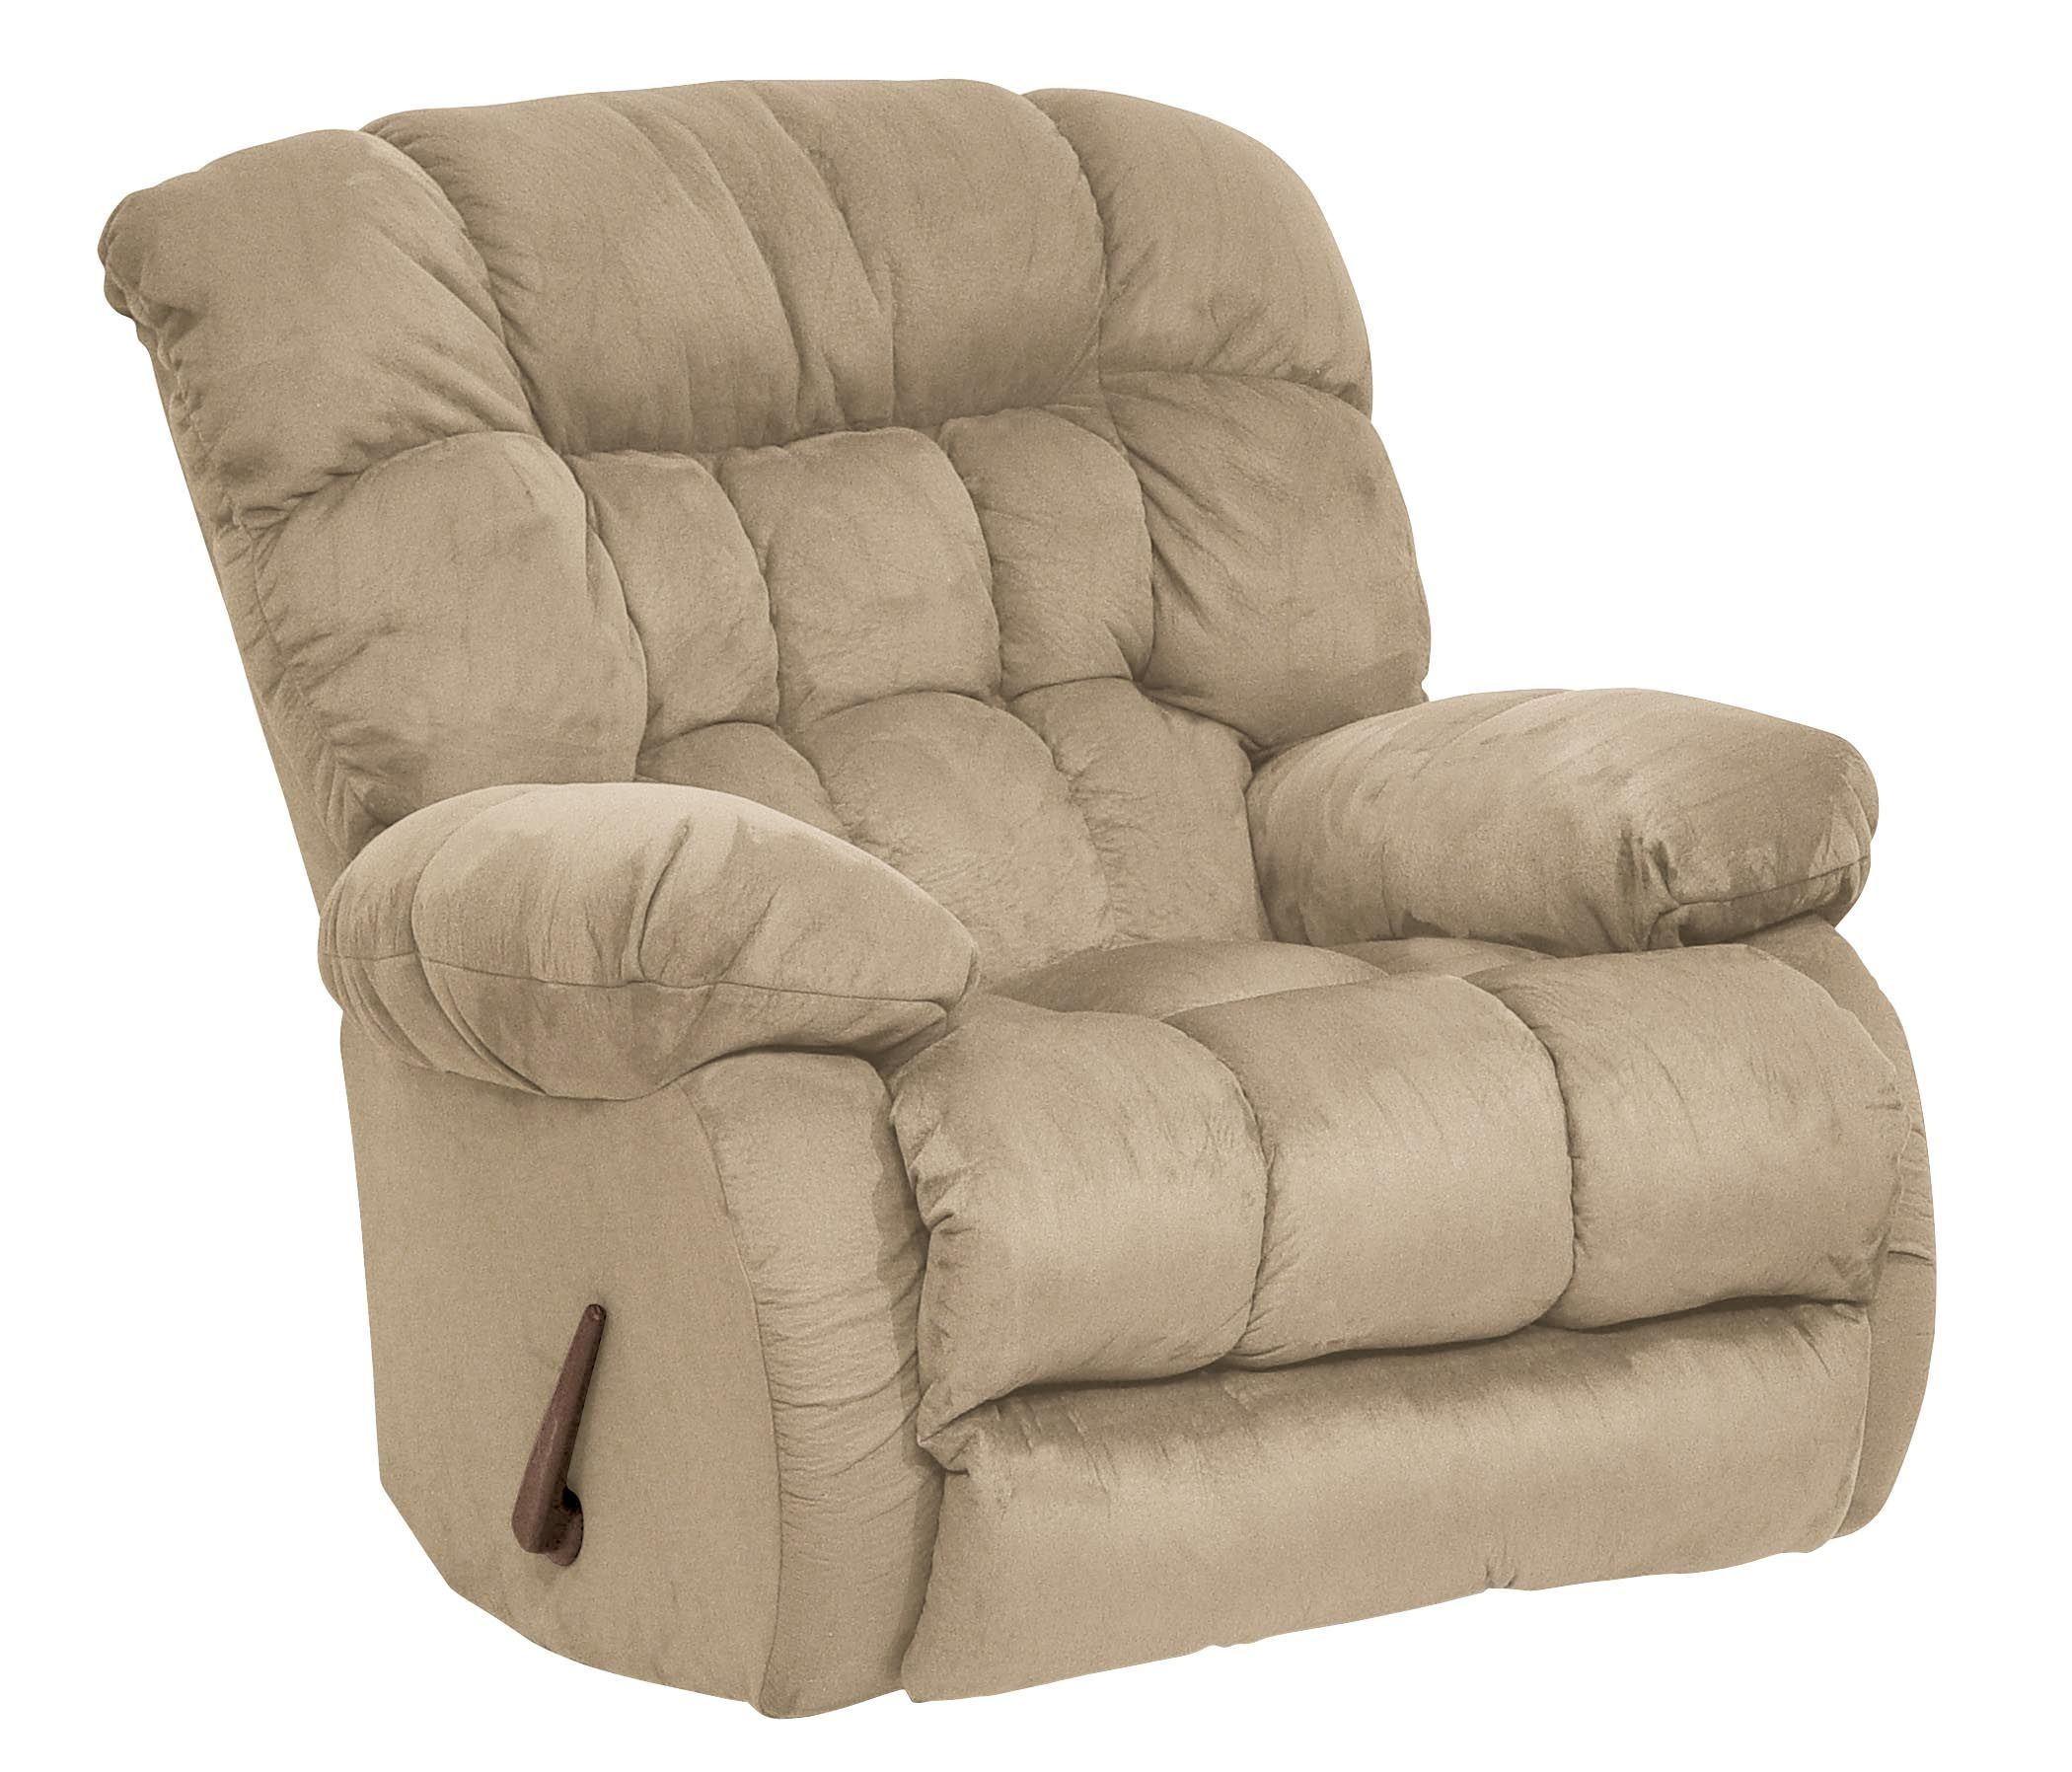 teddy bear hazelnut swivel glider recliner from catnapper 45175222036 coleman furniture. Black Bedroom Furniture Sets. Home Design Ideas